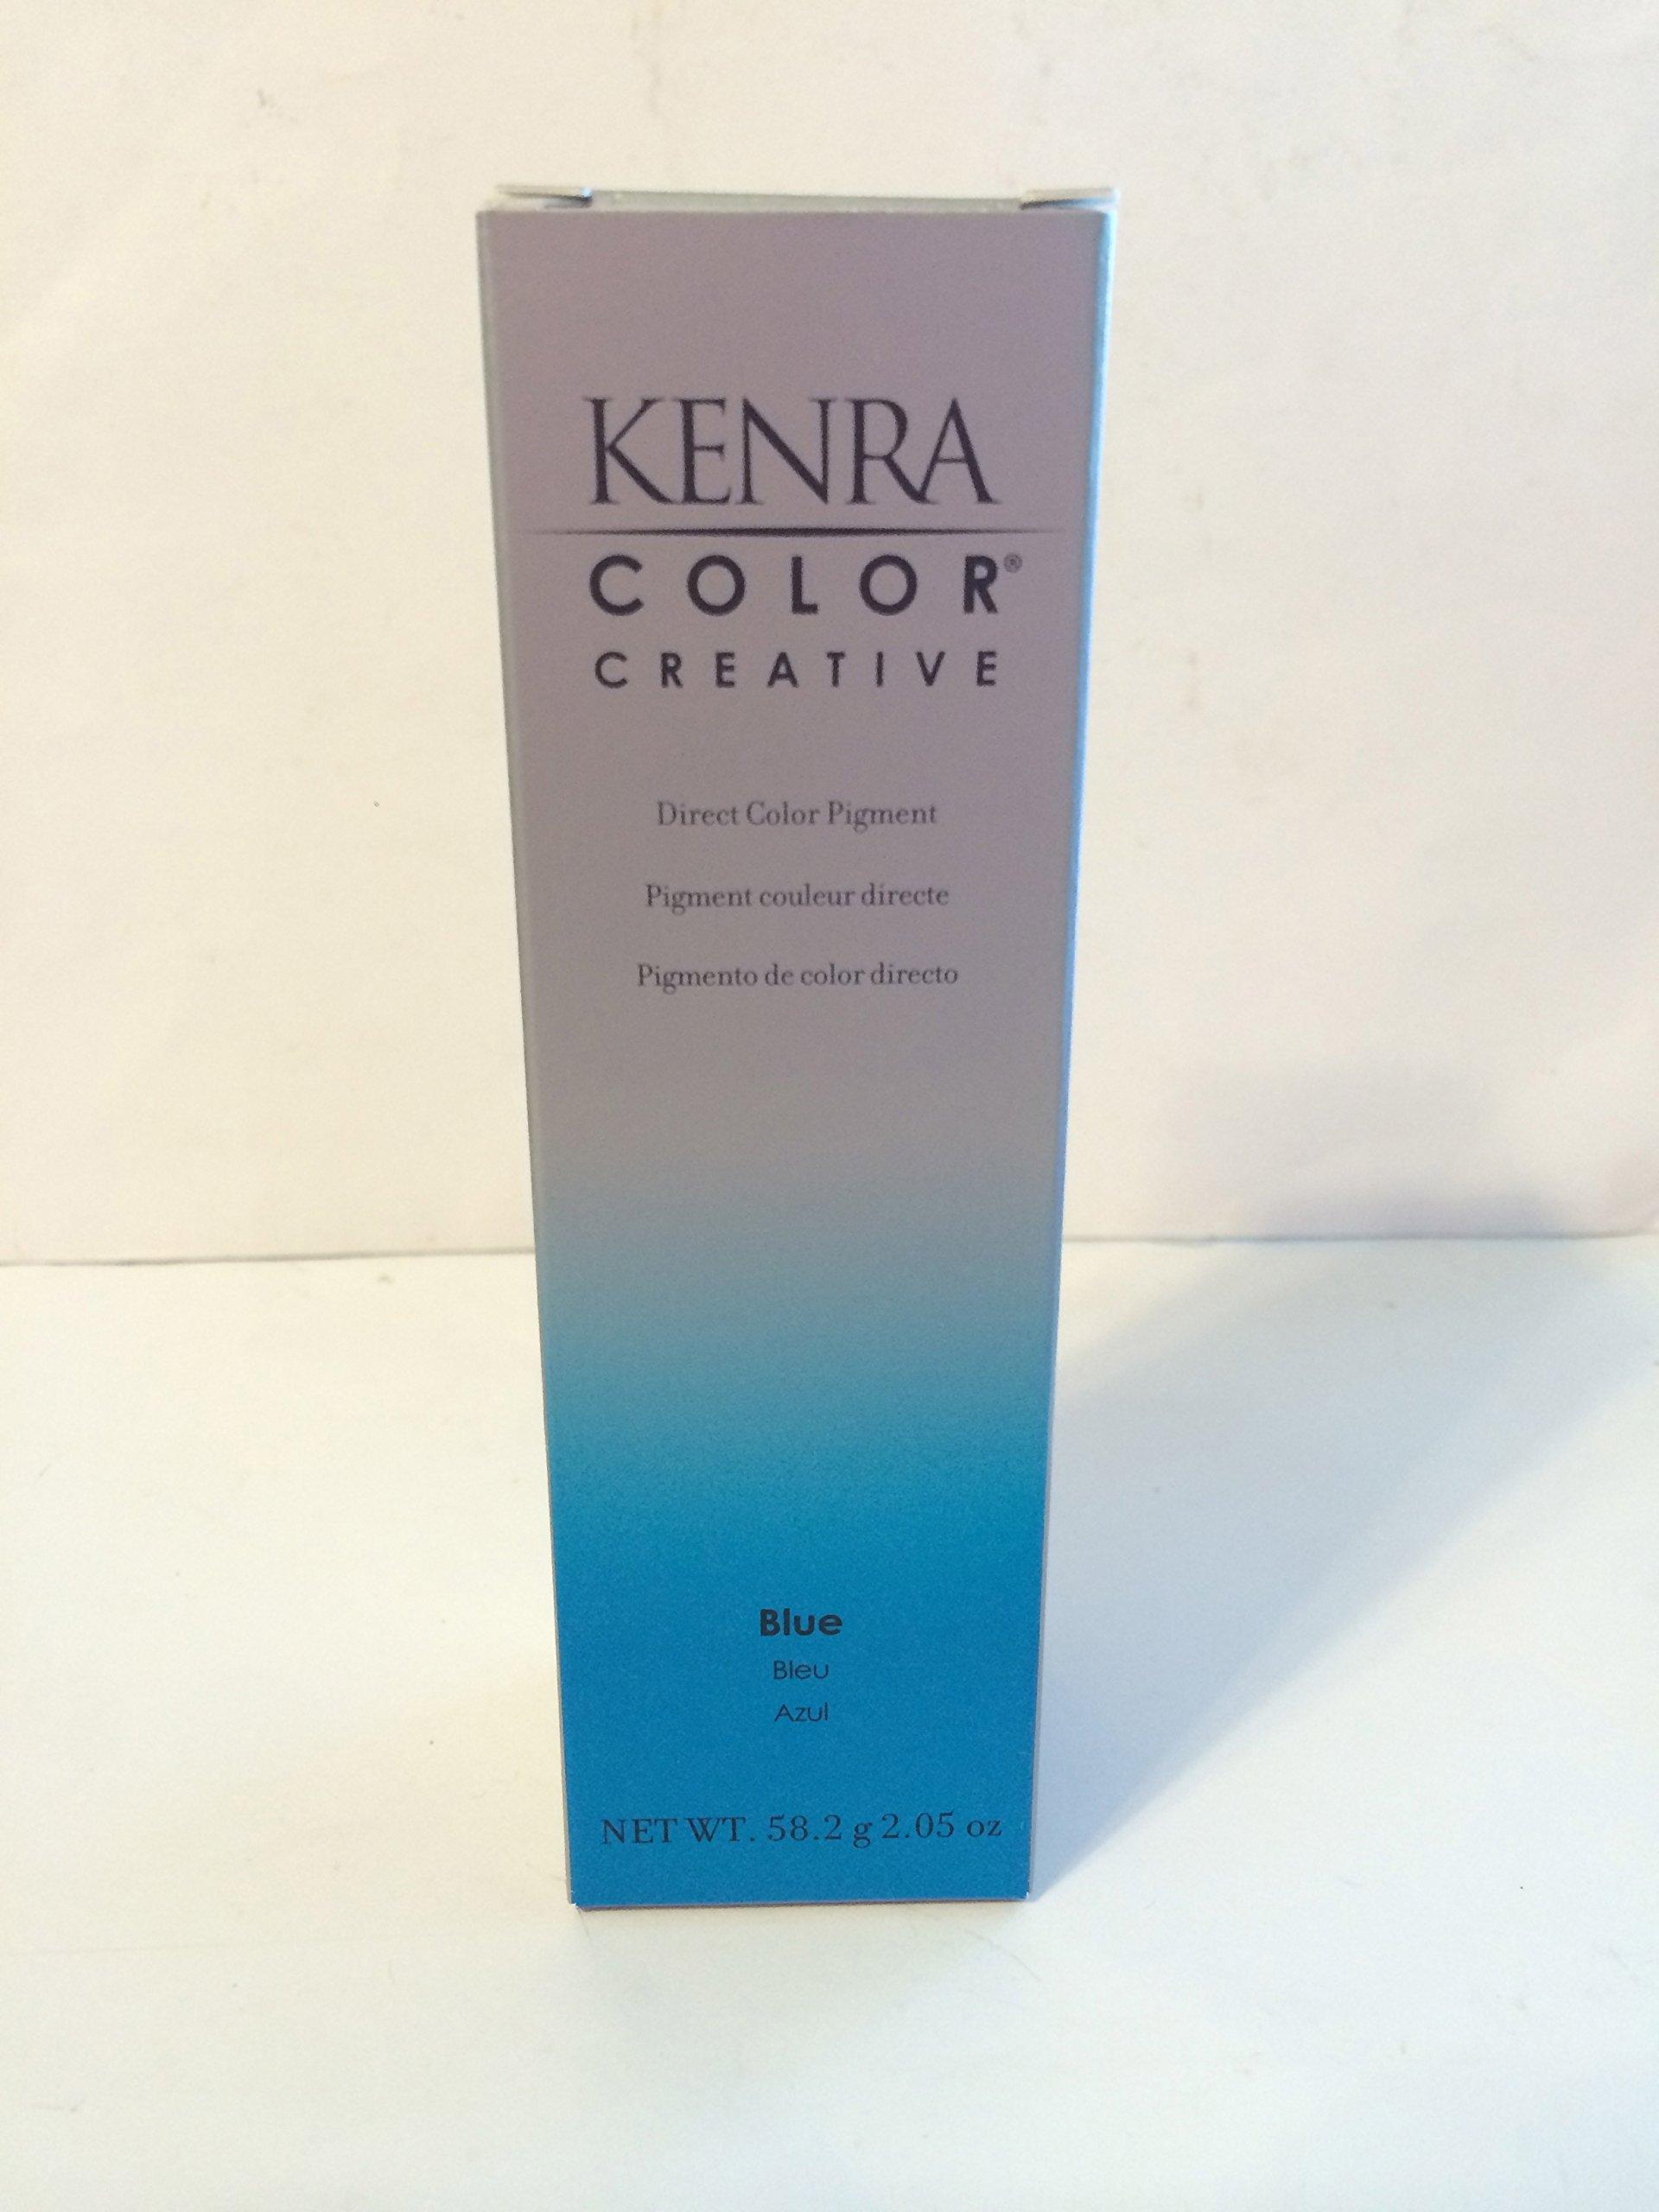 Kenra Color Creative Direct Color Pigment - BLUE 2.05